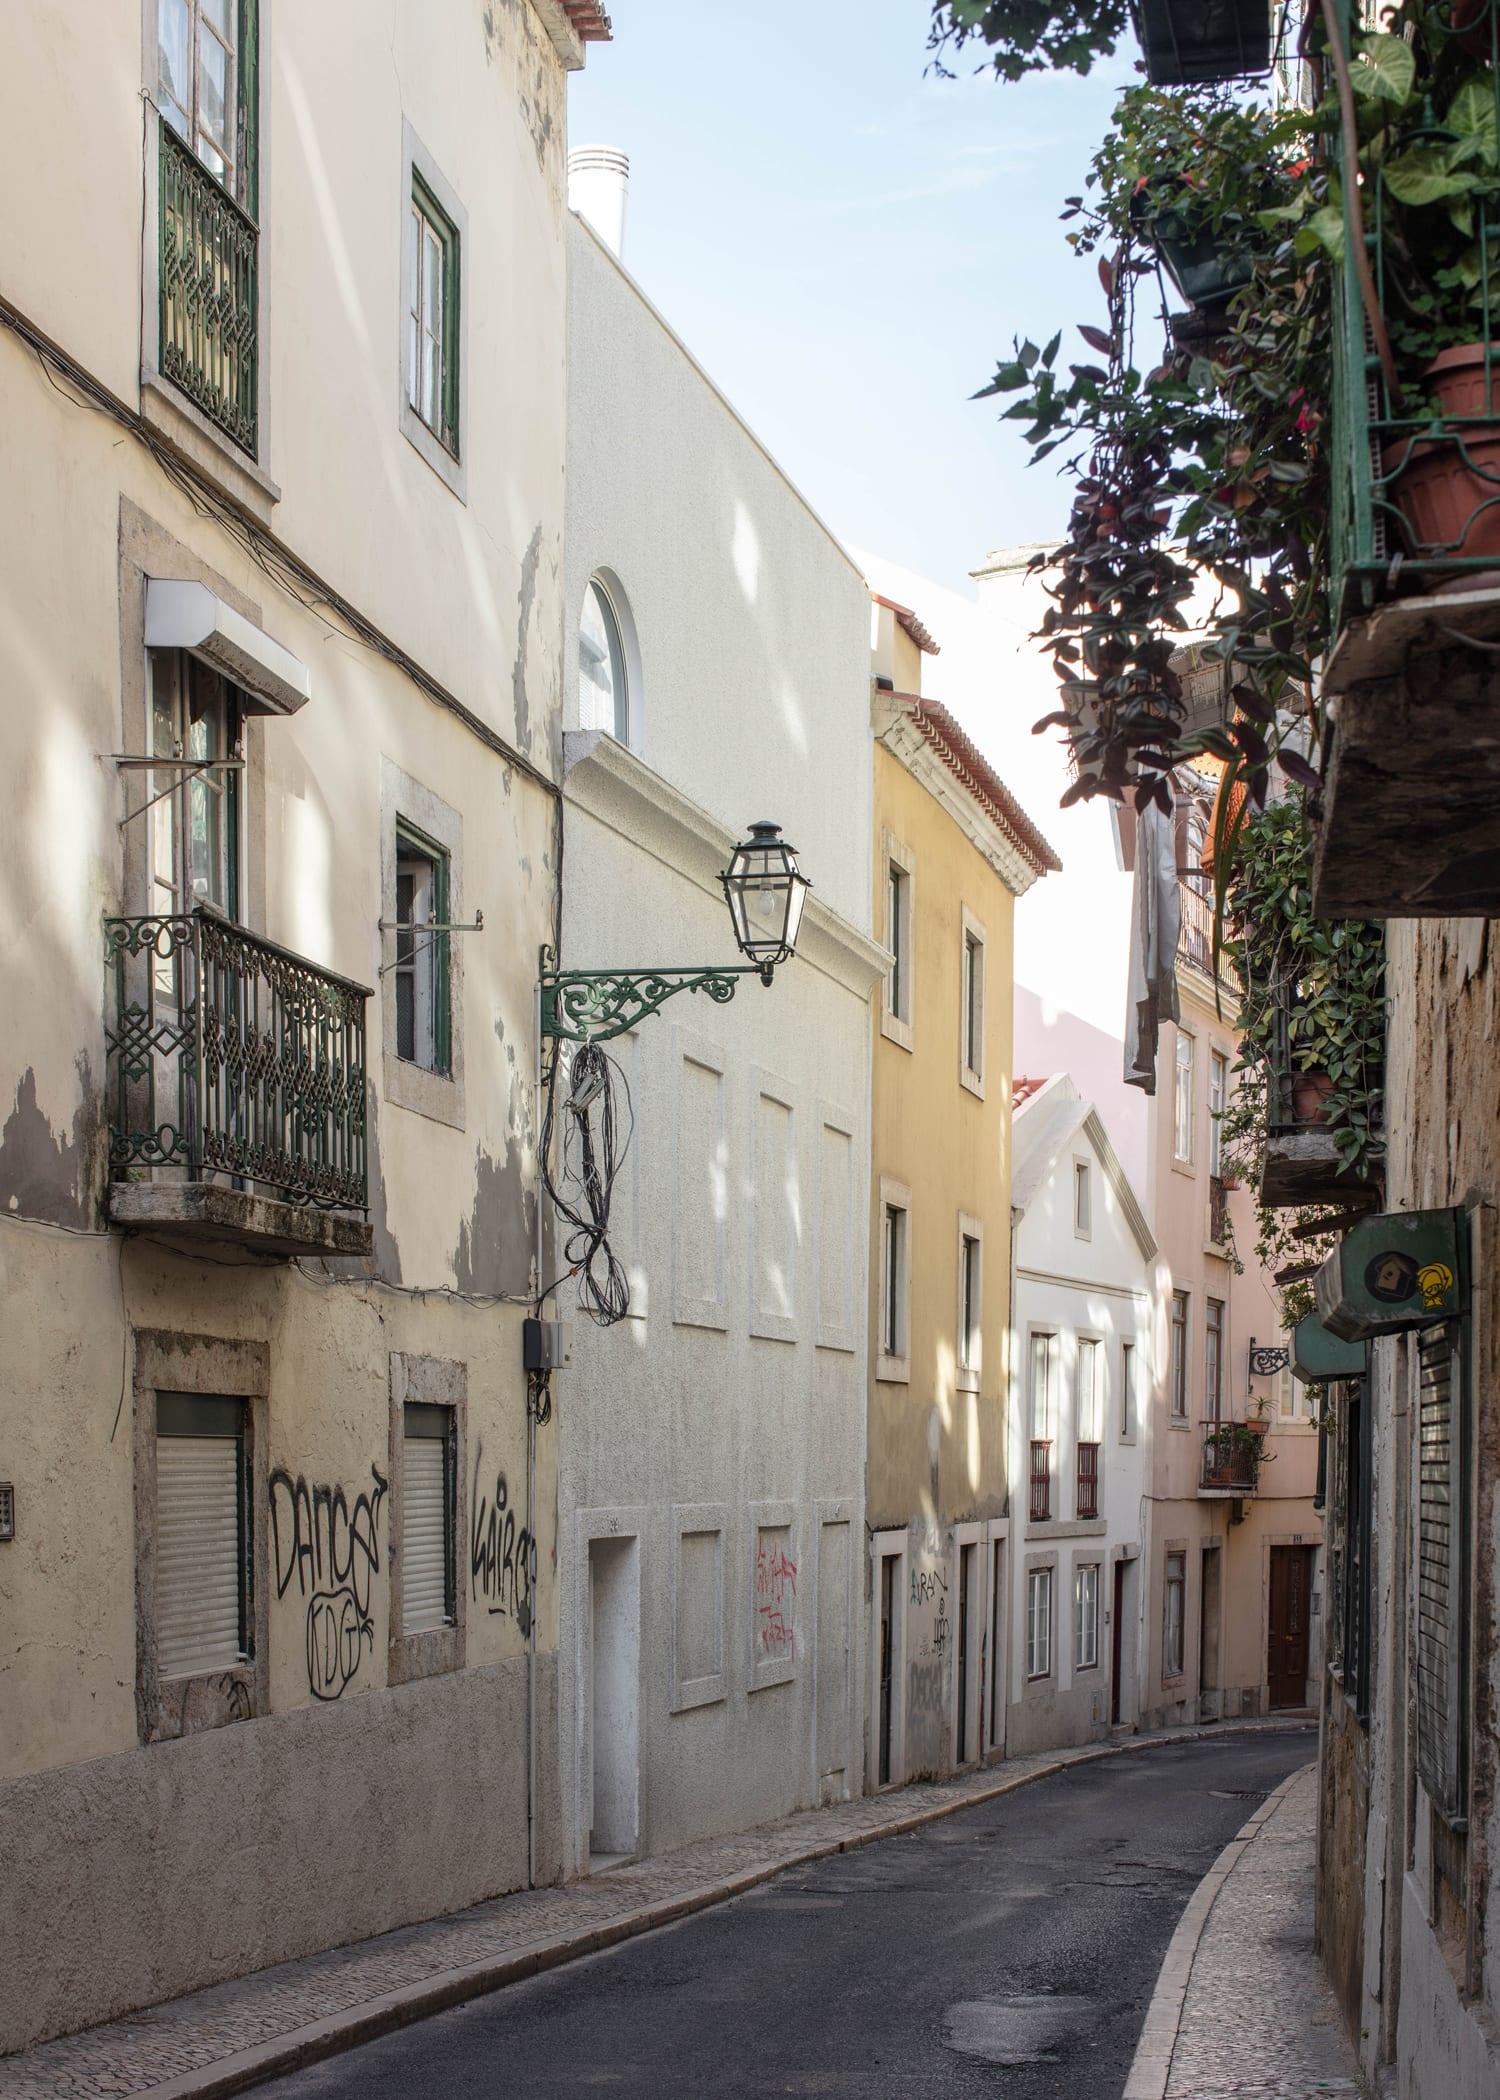 Dodged House In Lisbon By Leopold Banchini Daniel Zamarbide Yellowtrace 05